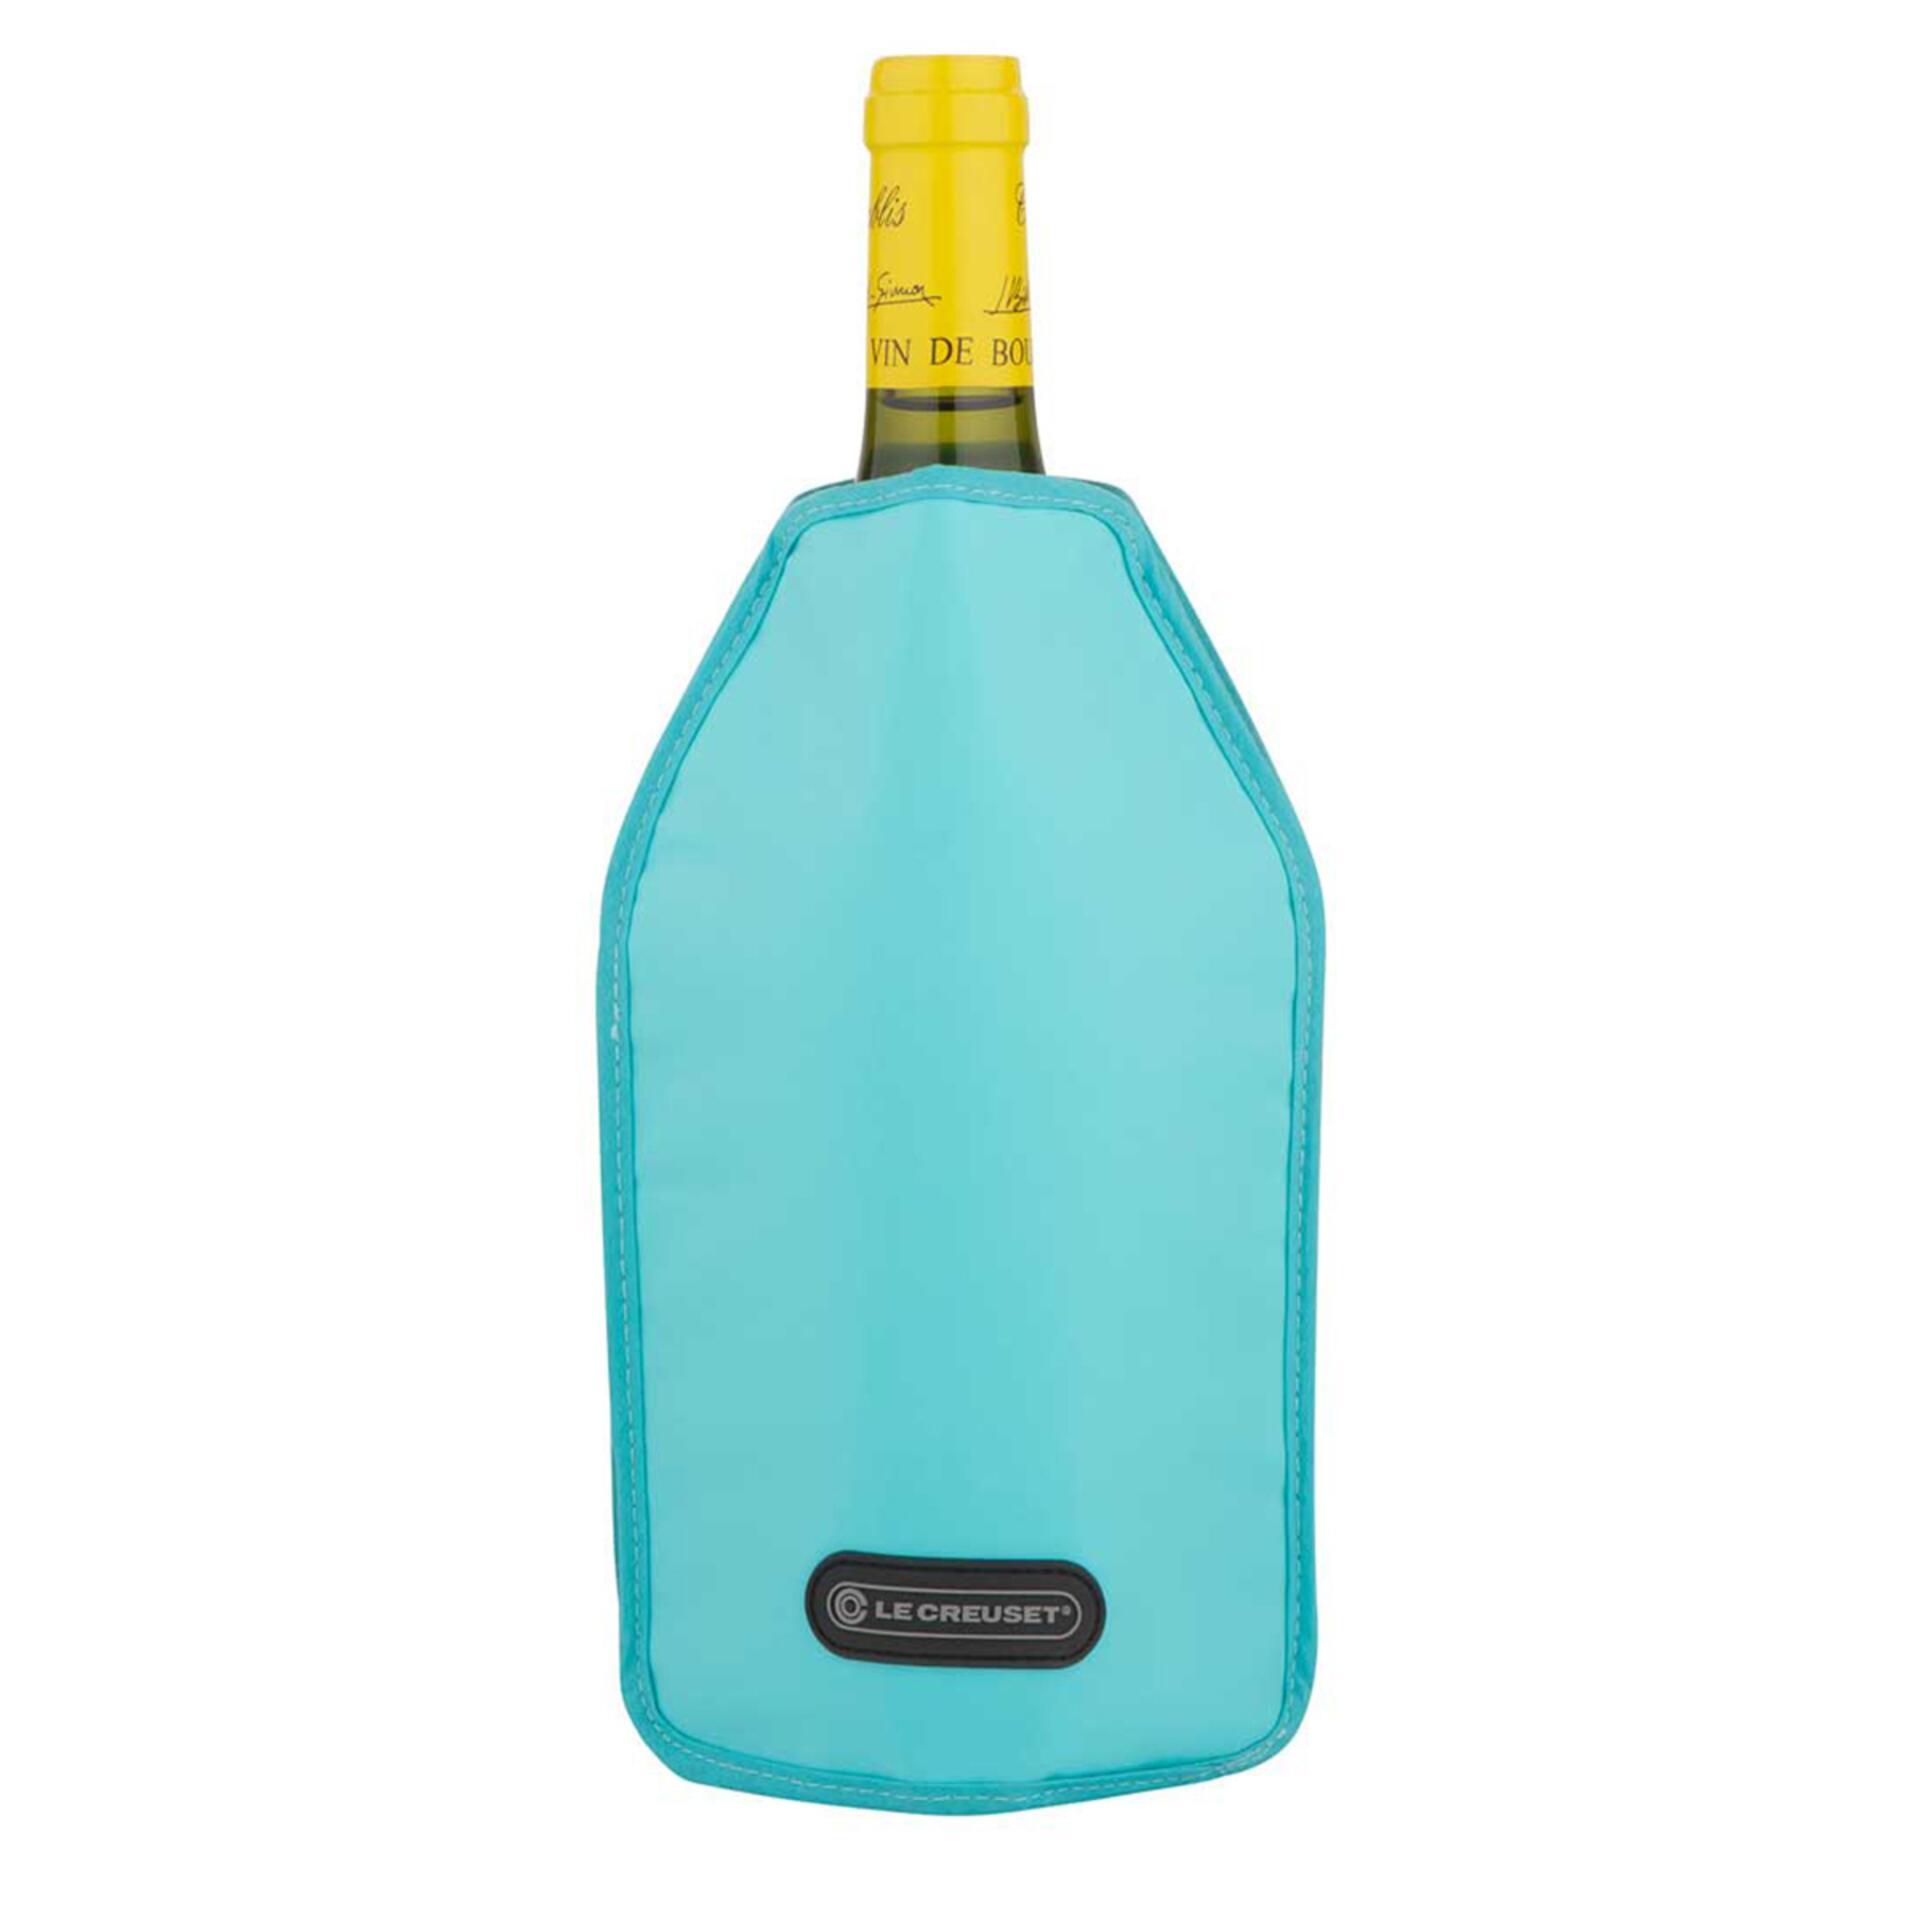 Le Creuset Screwpull Weinkühler WA-126 Karibik